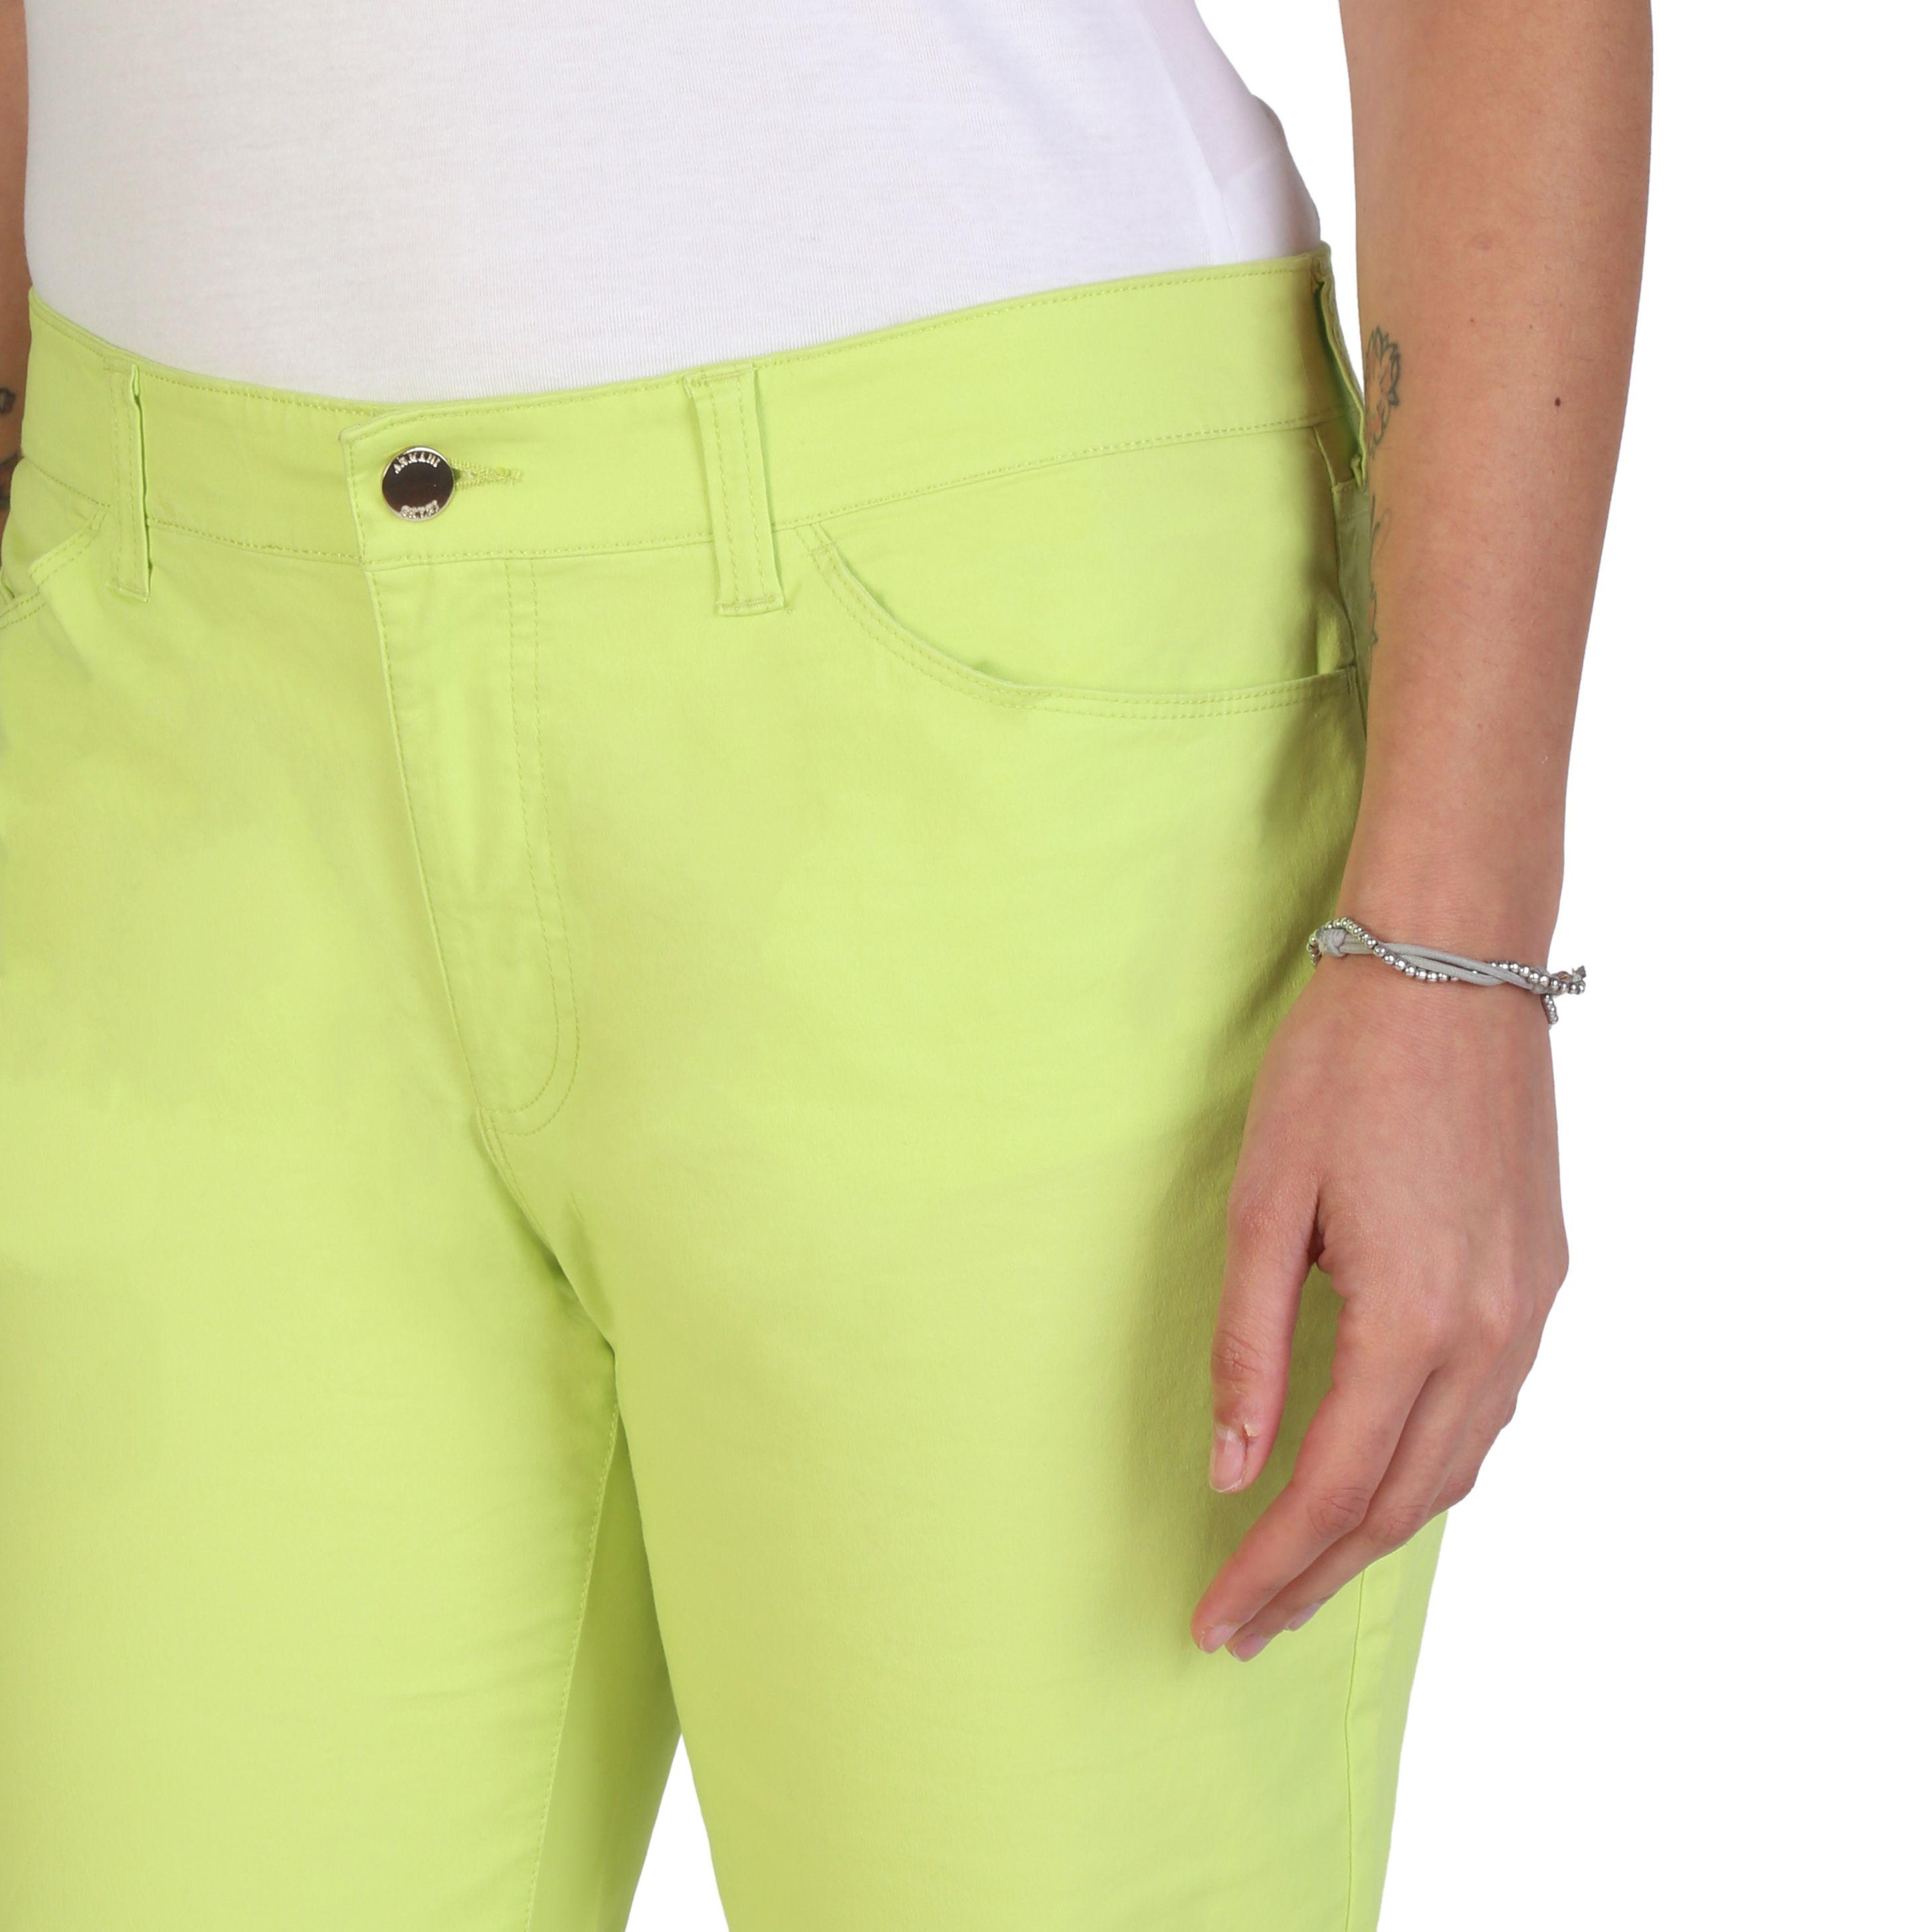 2D427B30 Aa62 11Ea Aaa4 4Fcd1Fe36E6D Armani Jeans - 3Y5J18_5Nzxz - Green